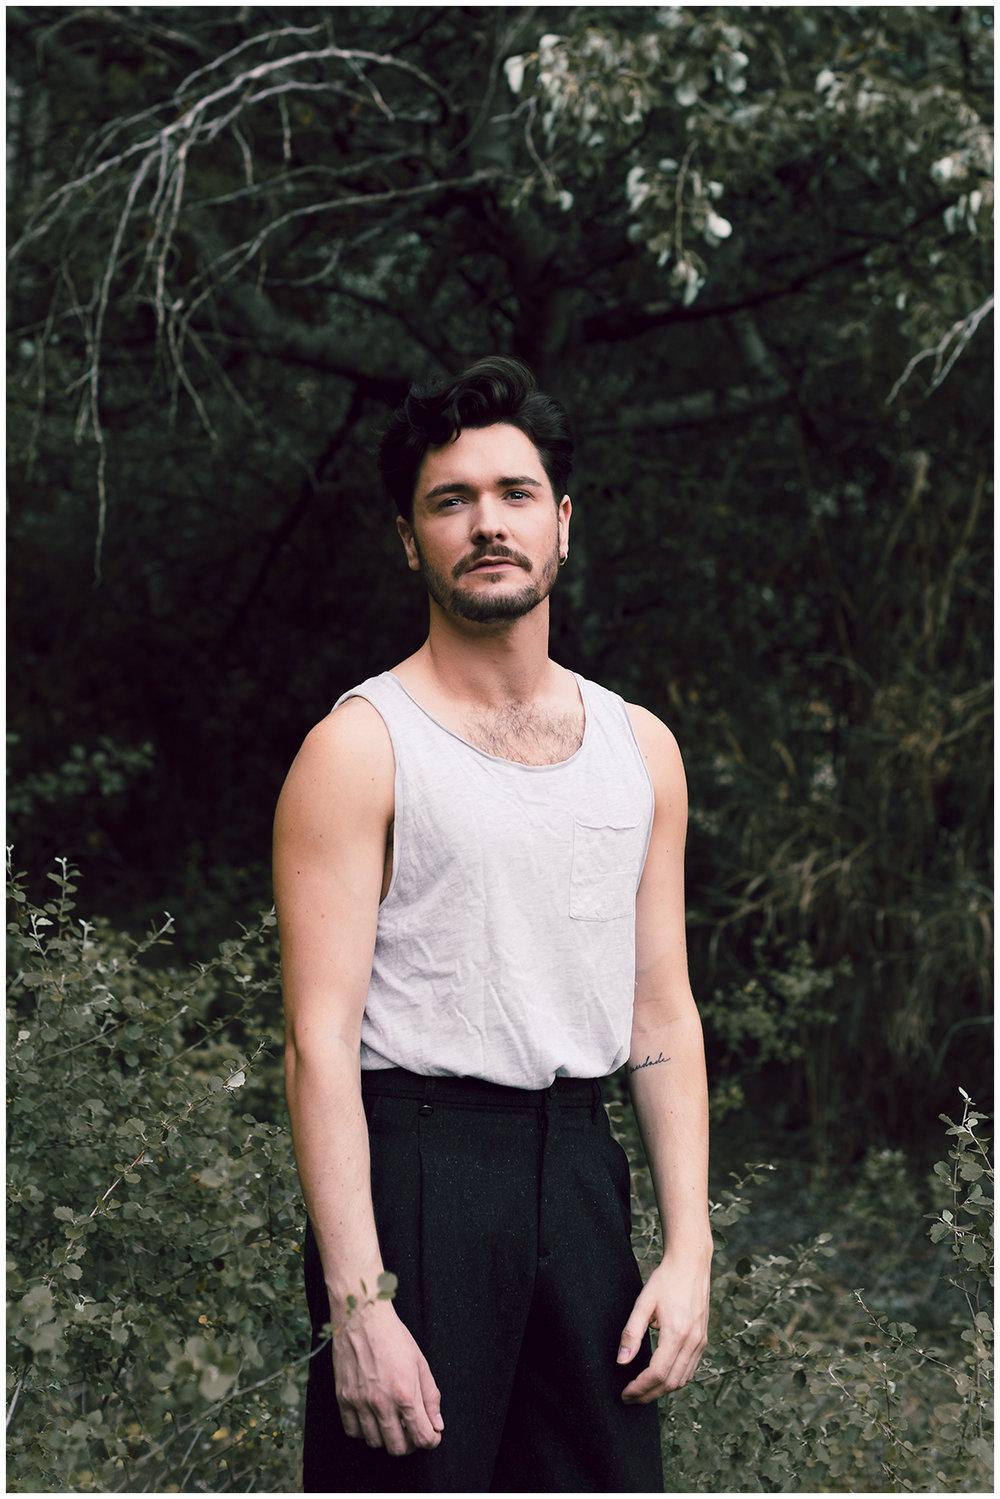 Carlos-Editorial-Moda-Retrato_Jose-Angel-Fotografia-58.jpg